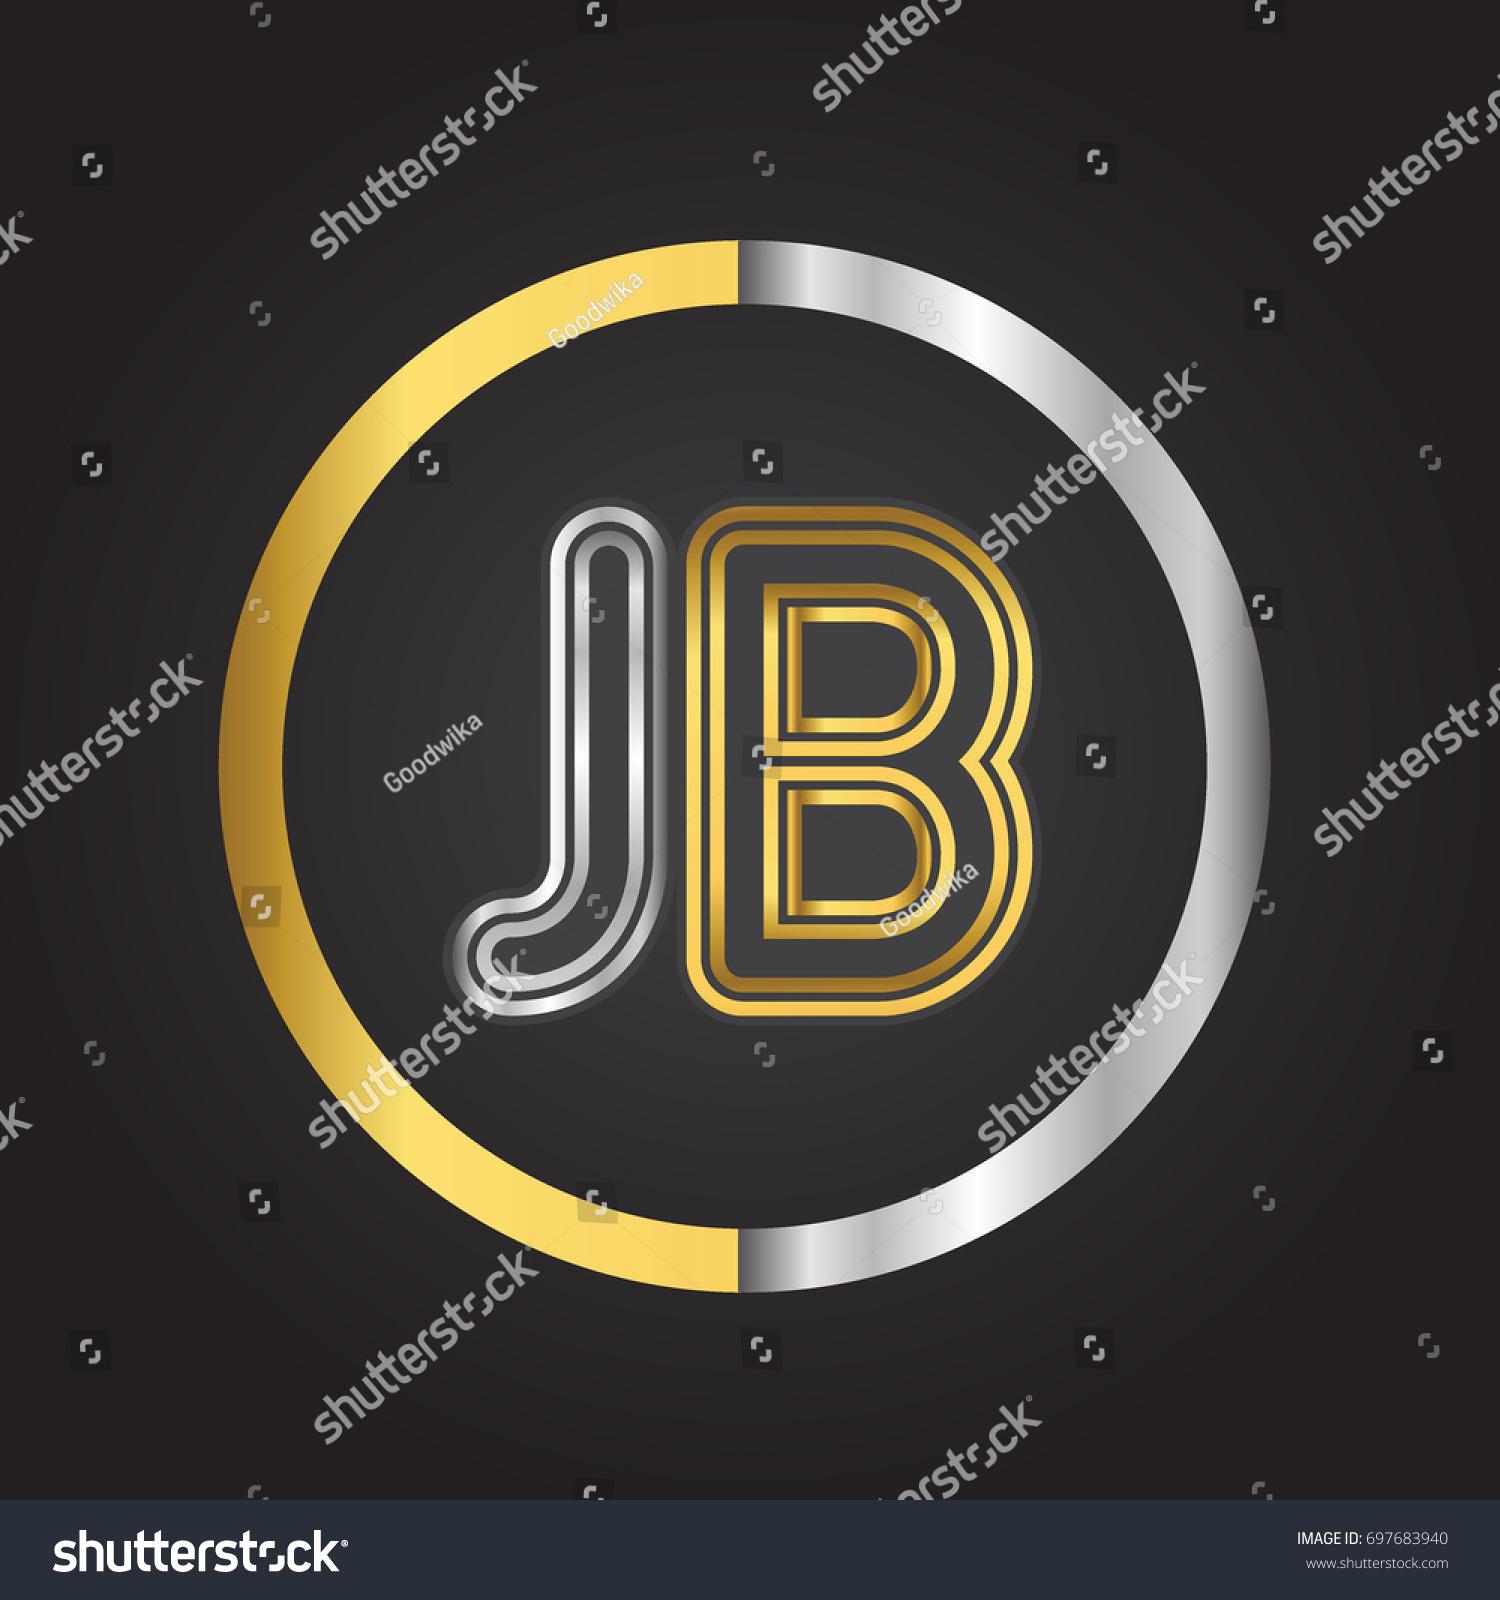 jb letter logo circle gold silver stock vector 697683940